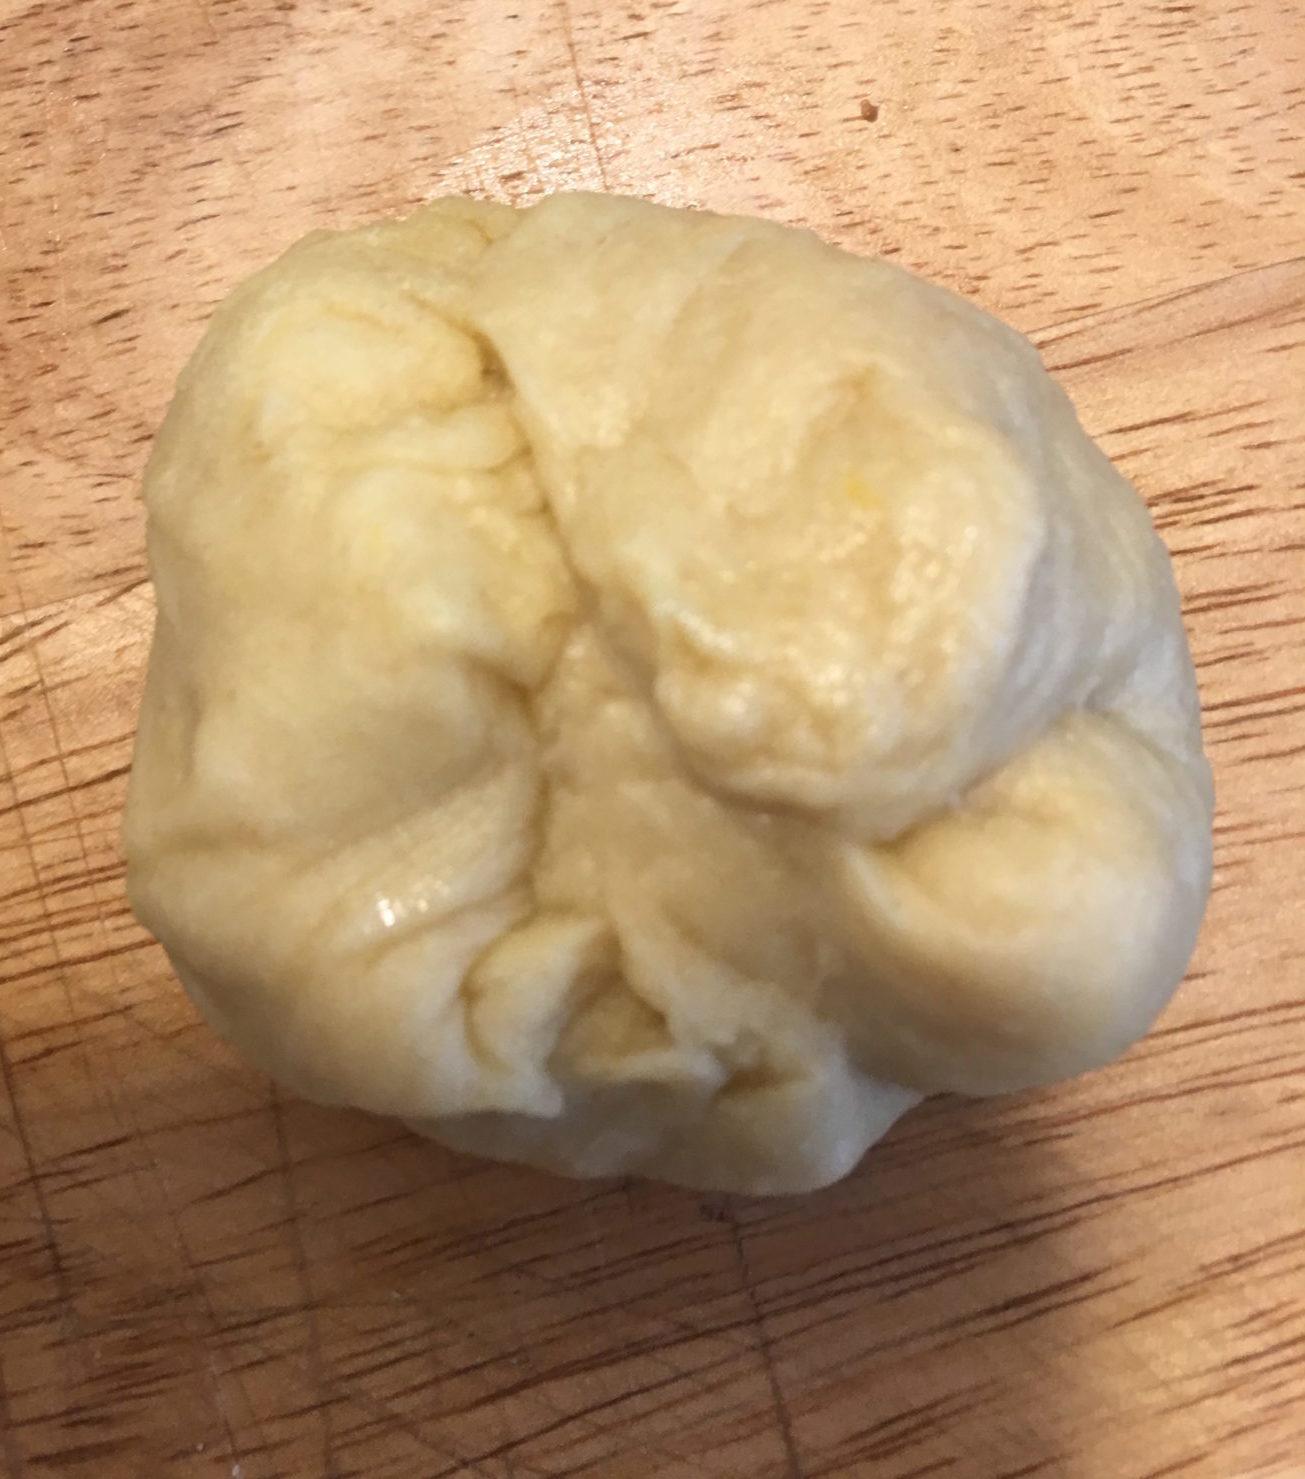 Almond Bun before cooking